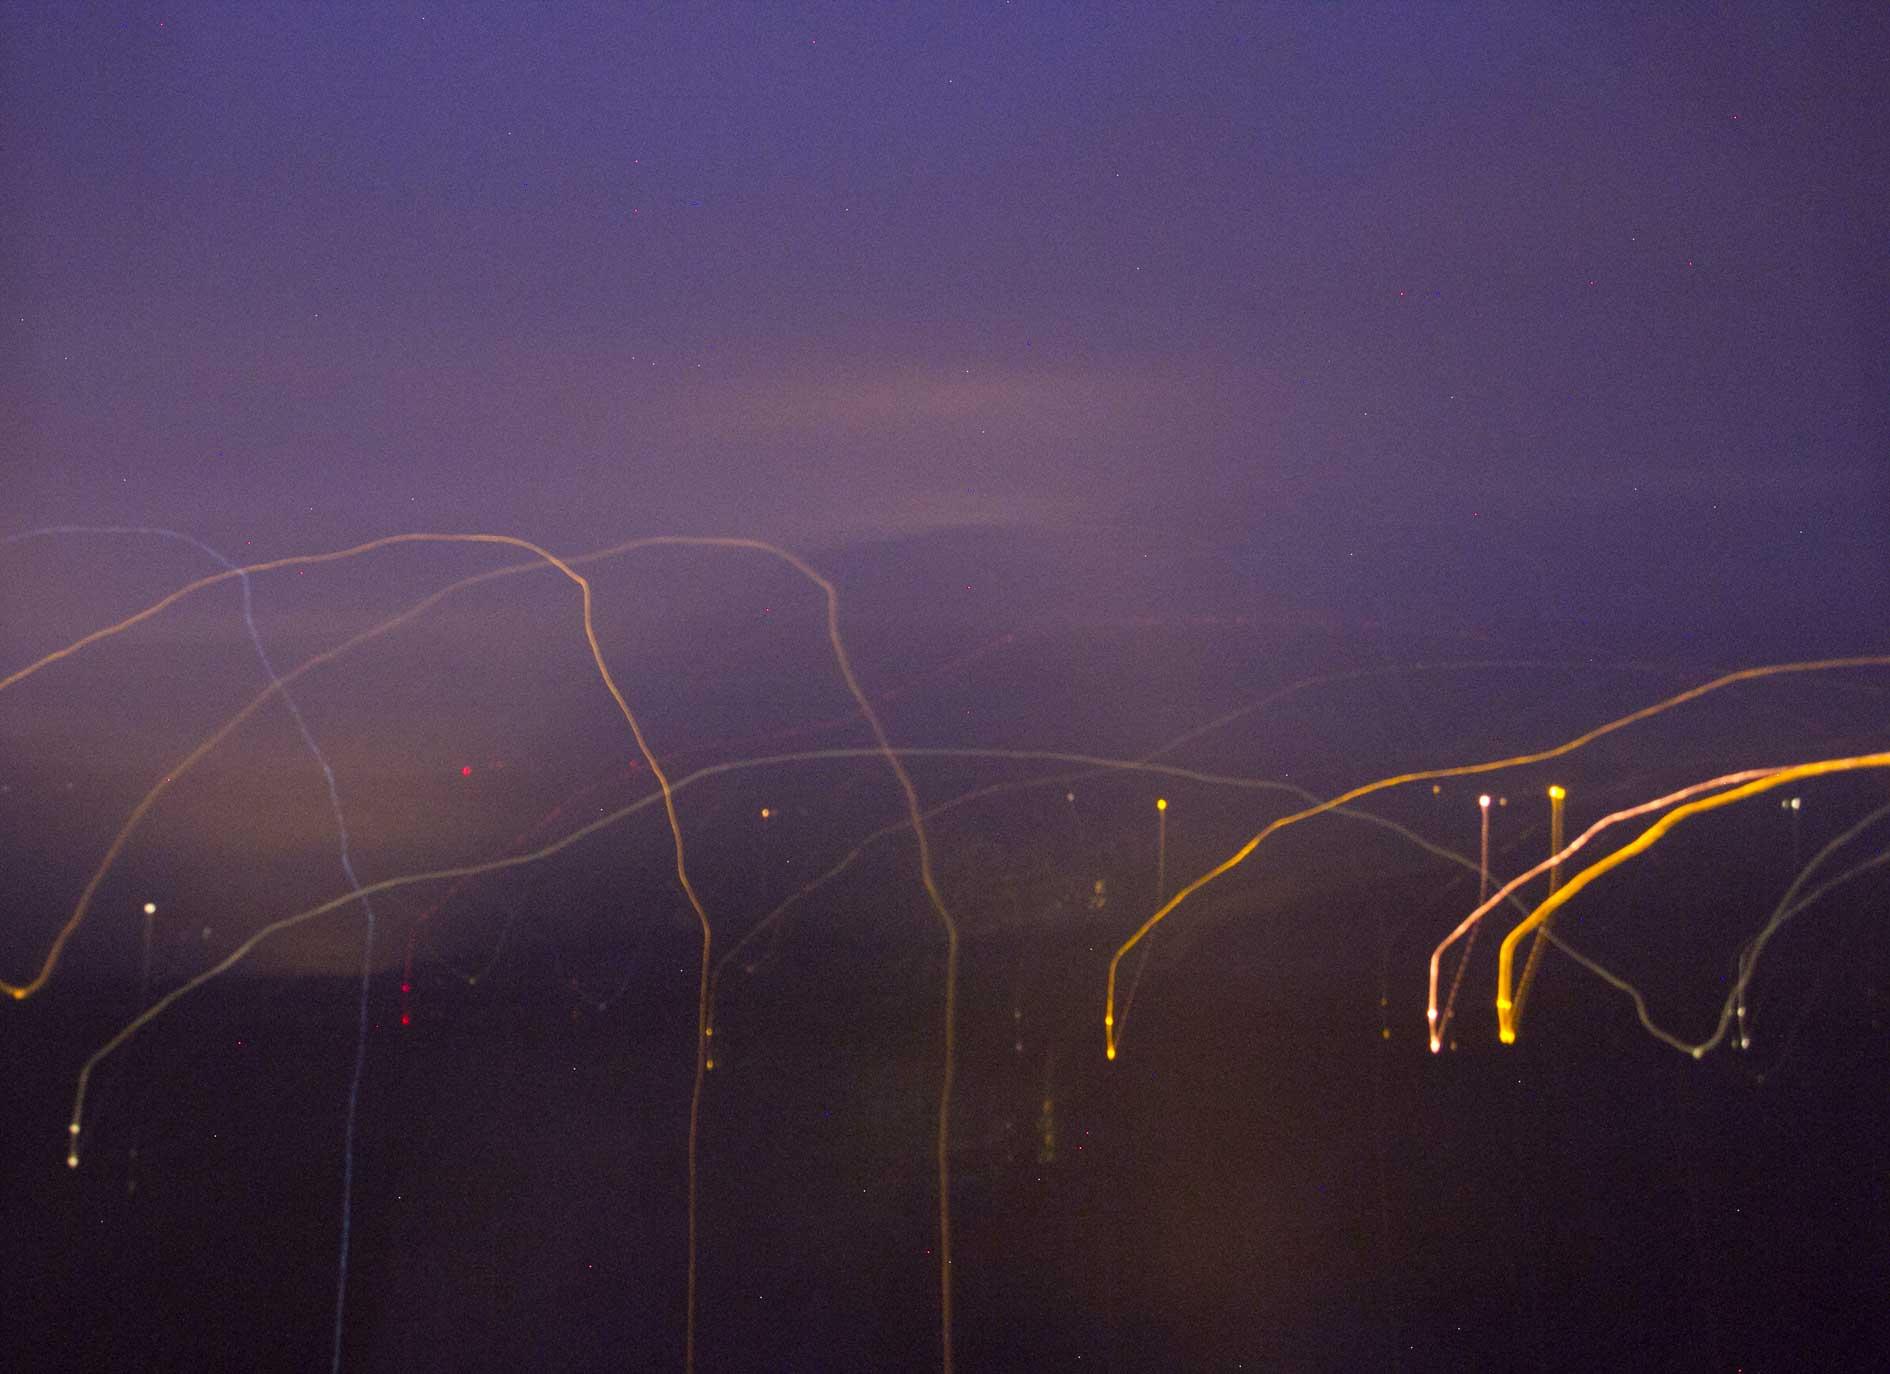 aurora-and-light-painting-5.jpg